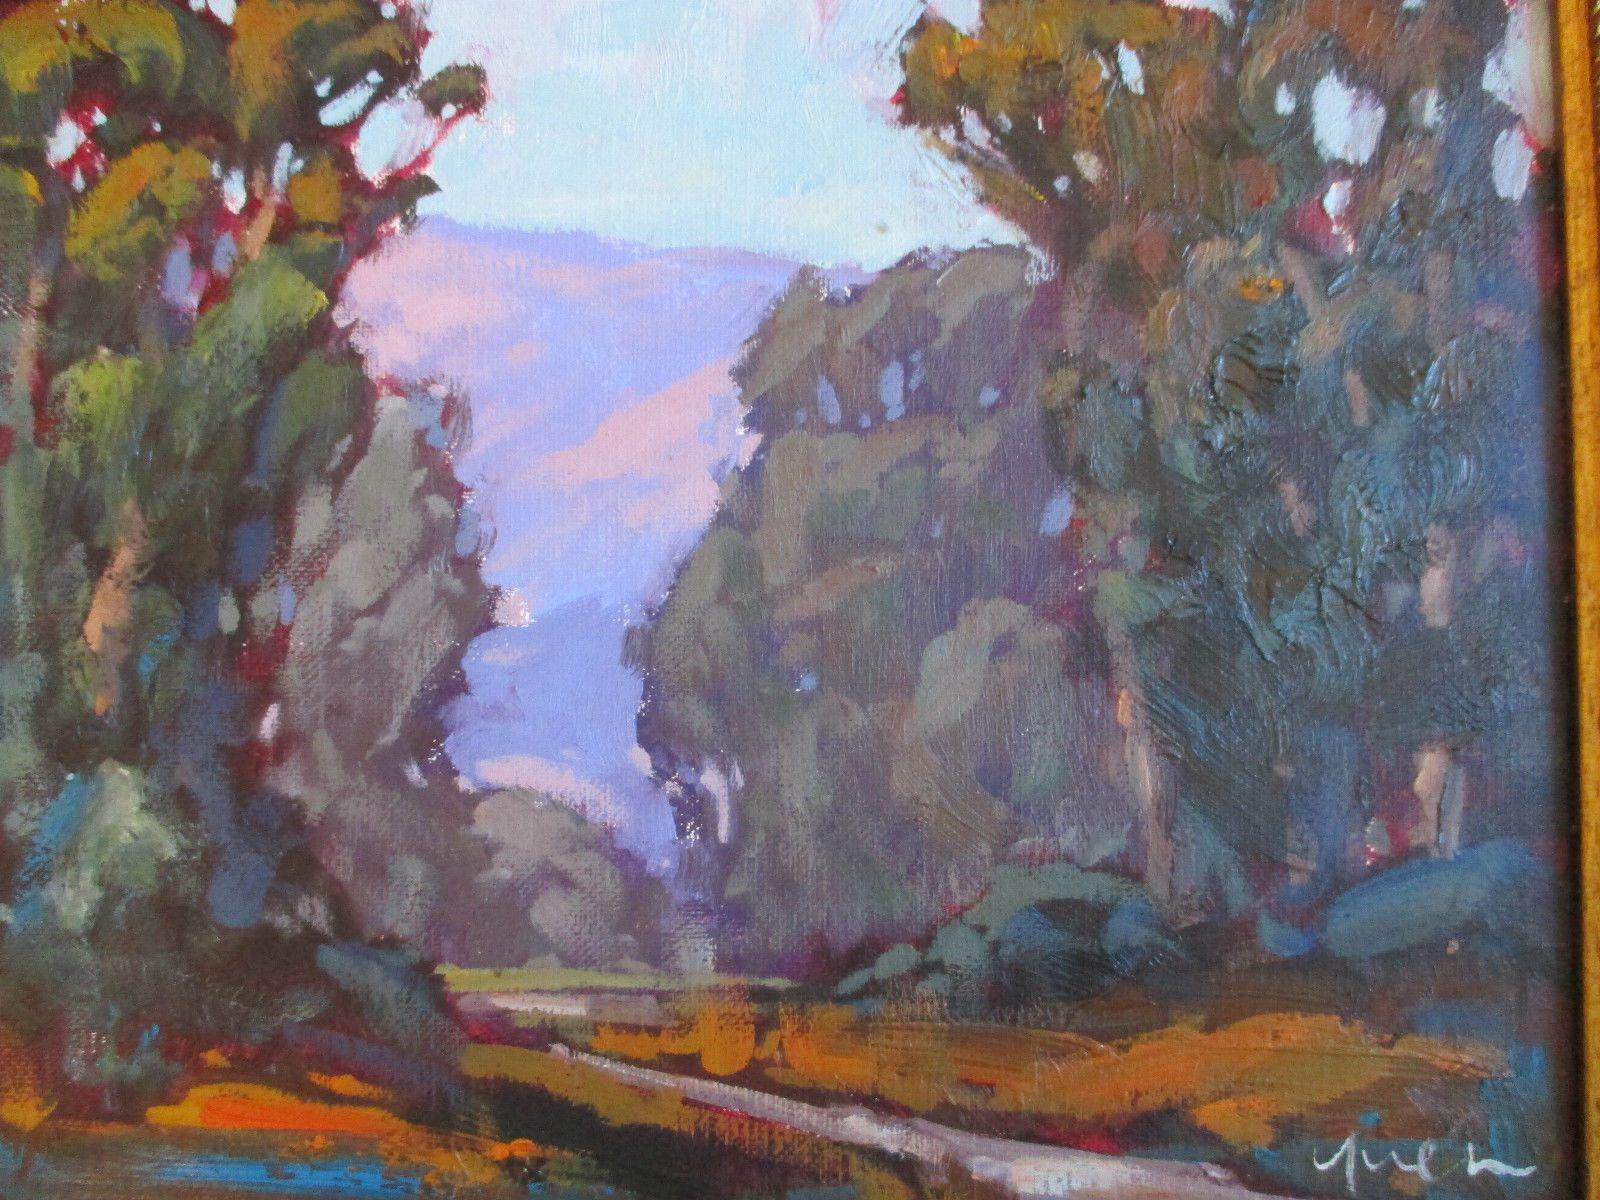 Kevin Yuen California Impressionist Eucalyptus Mountain Landscape Oil Painting Ebay Painting Oil Painting Landscape Landscape Art